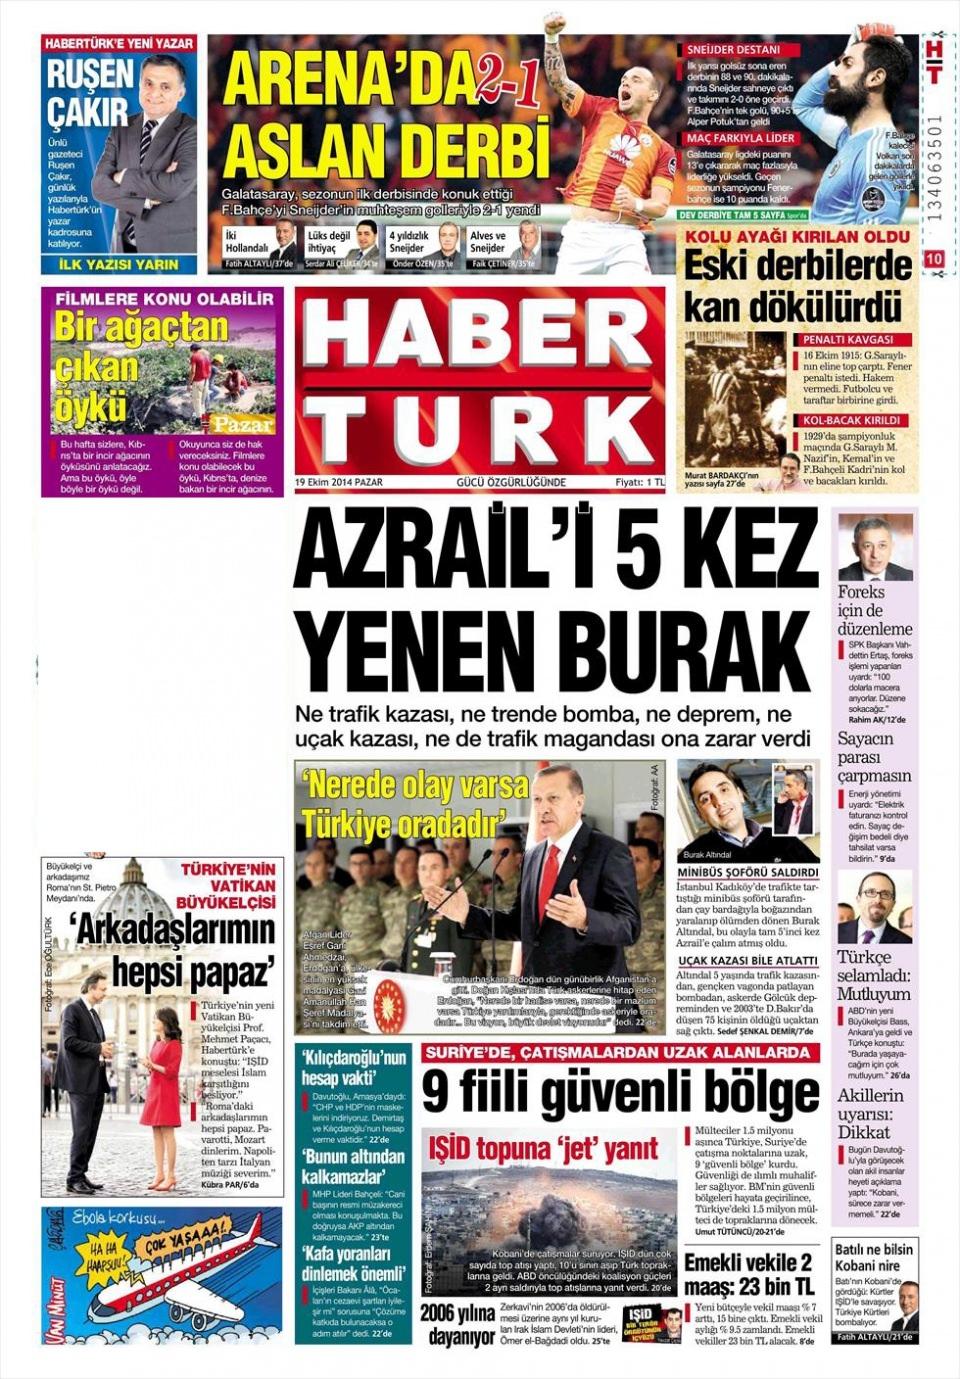 19 Ekim 2014 gazete manşetleri 16